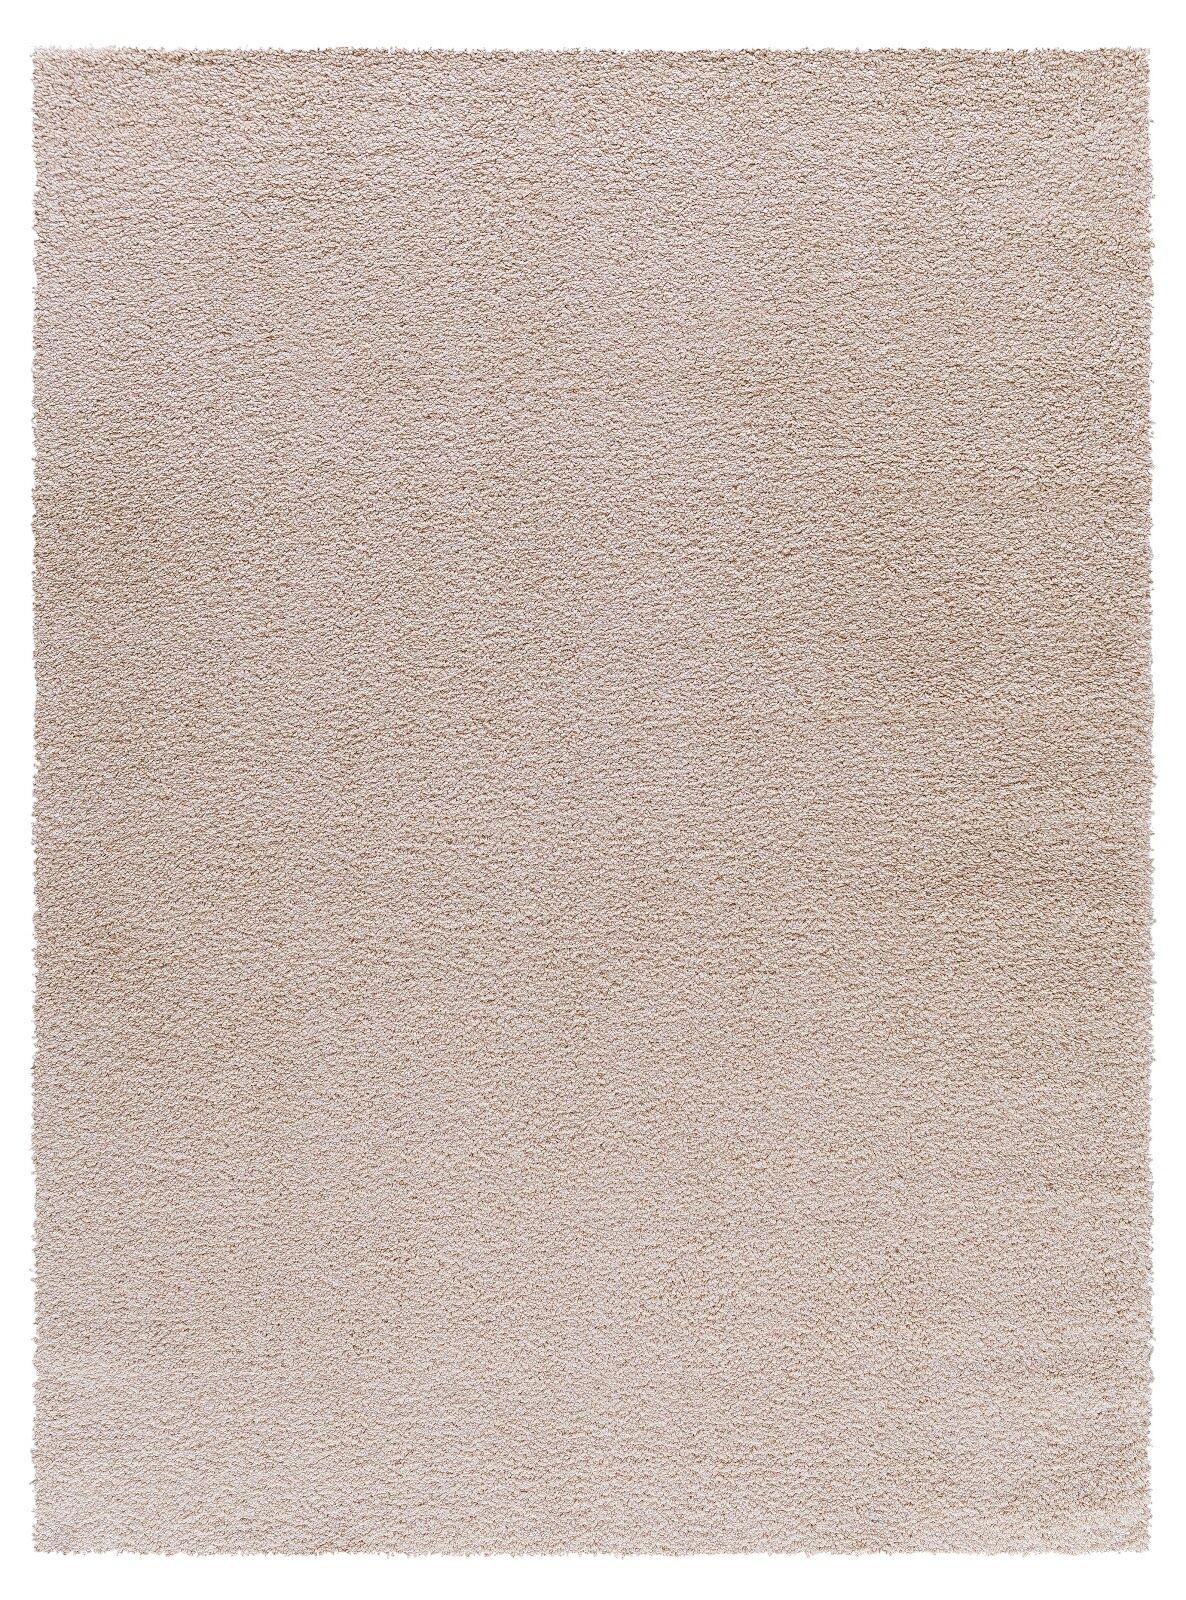 Gassin Shag Beige Area Rug Rug Size: Rectangle 2' x 8'